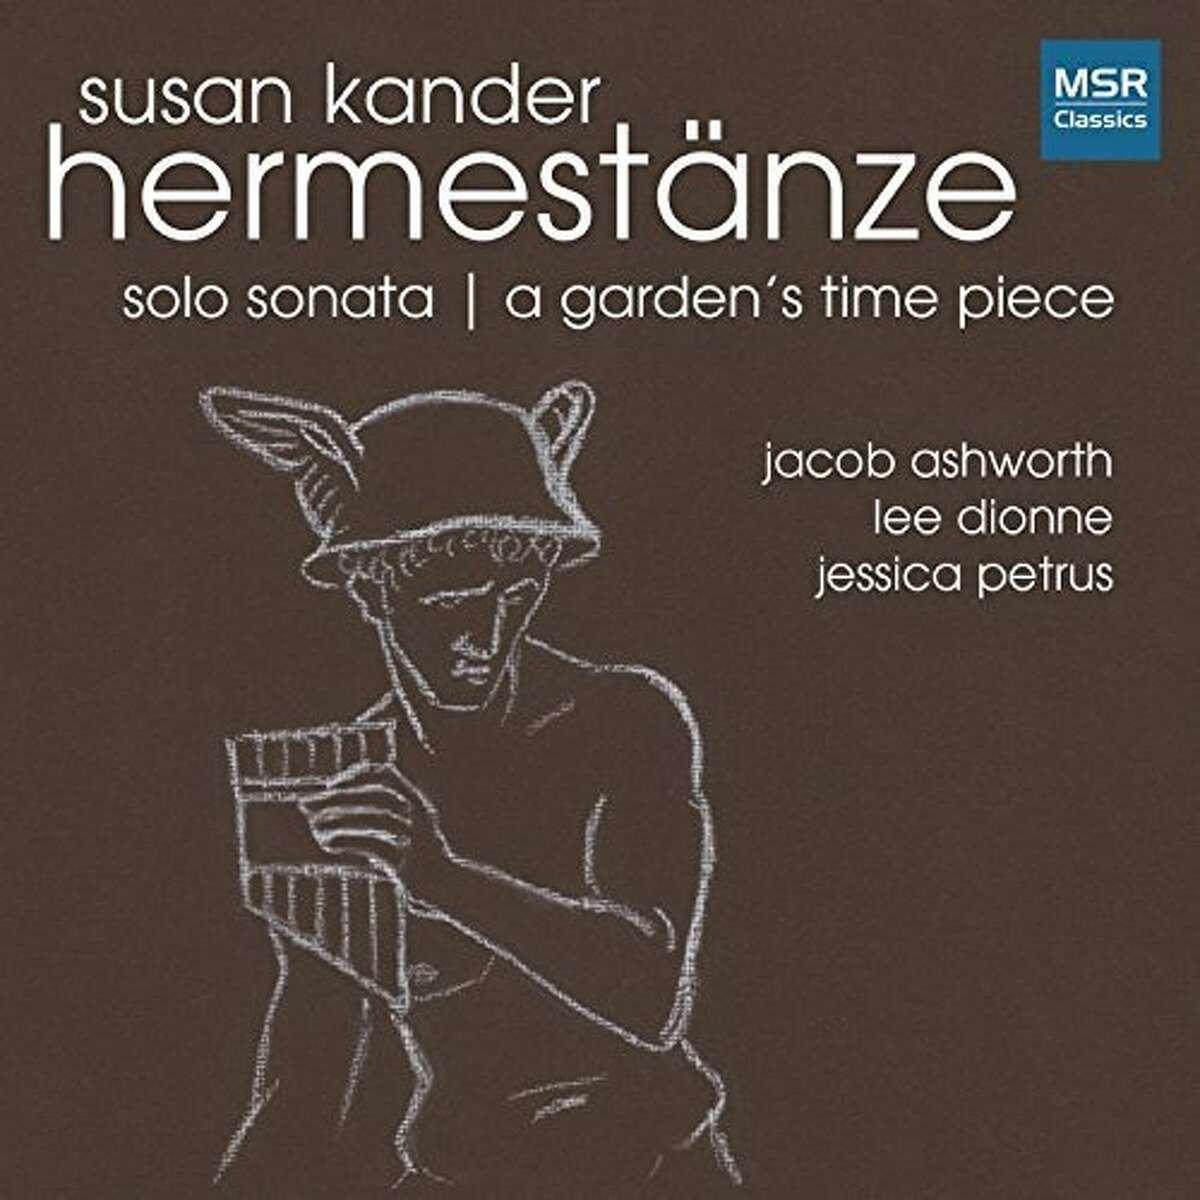 Susan Kander, 'Hermest�nze'